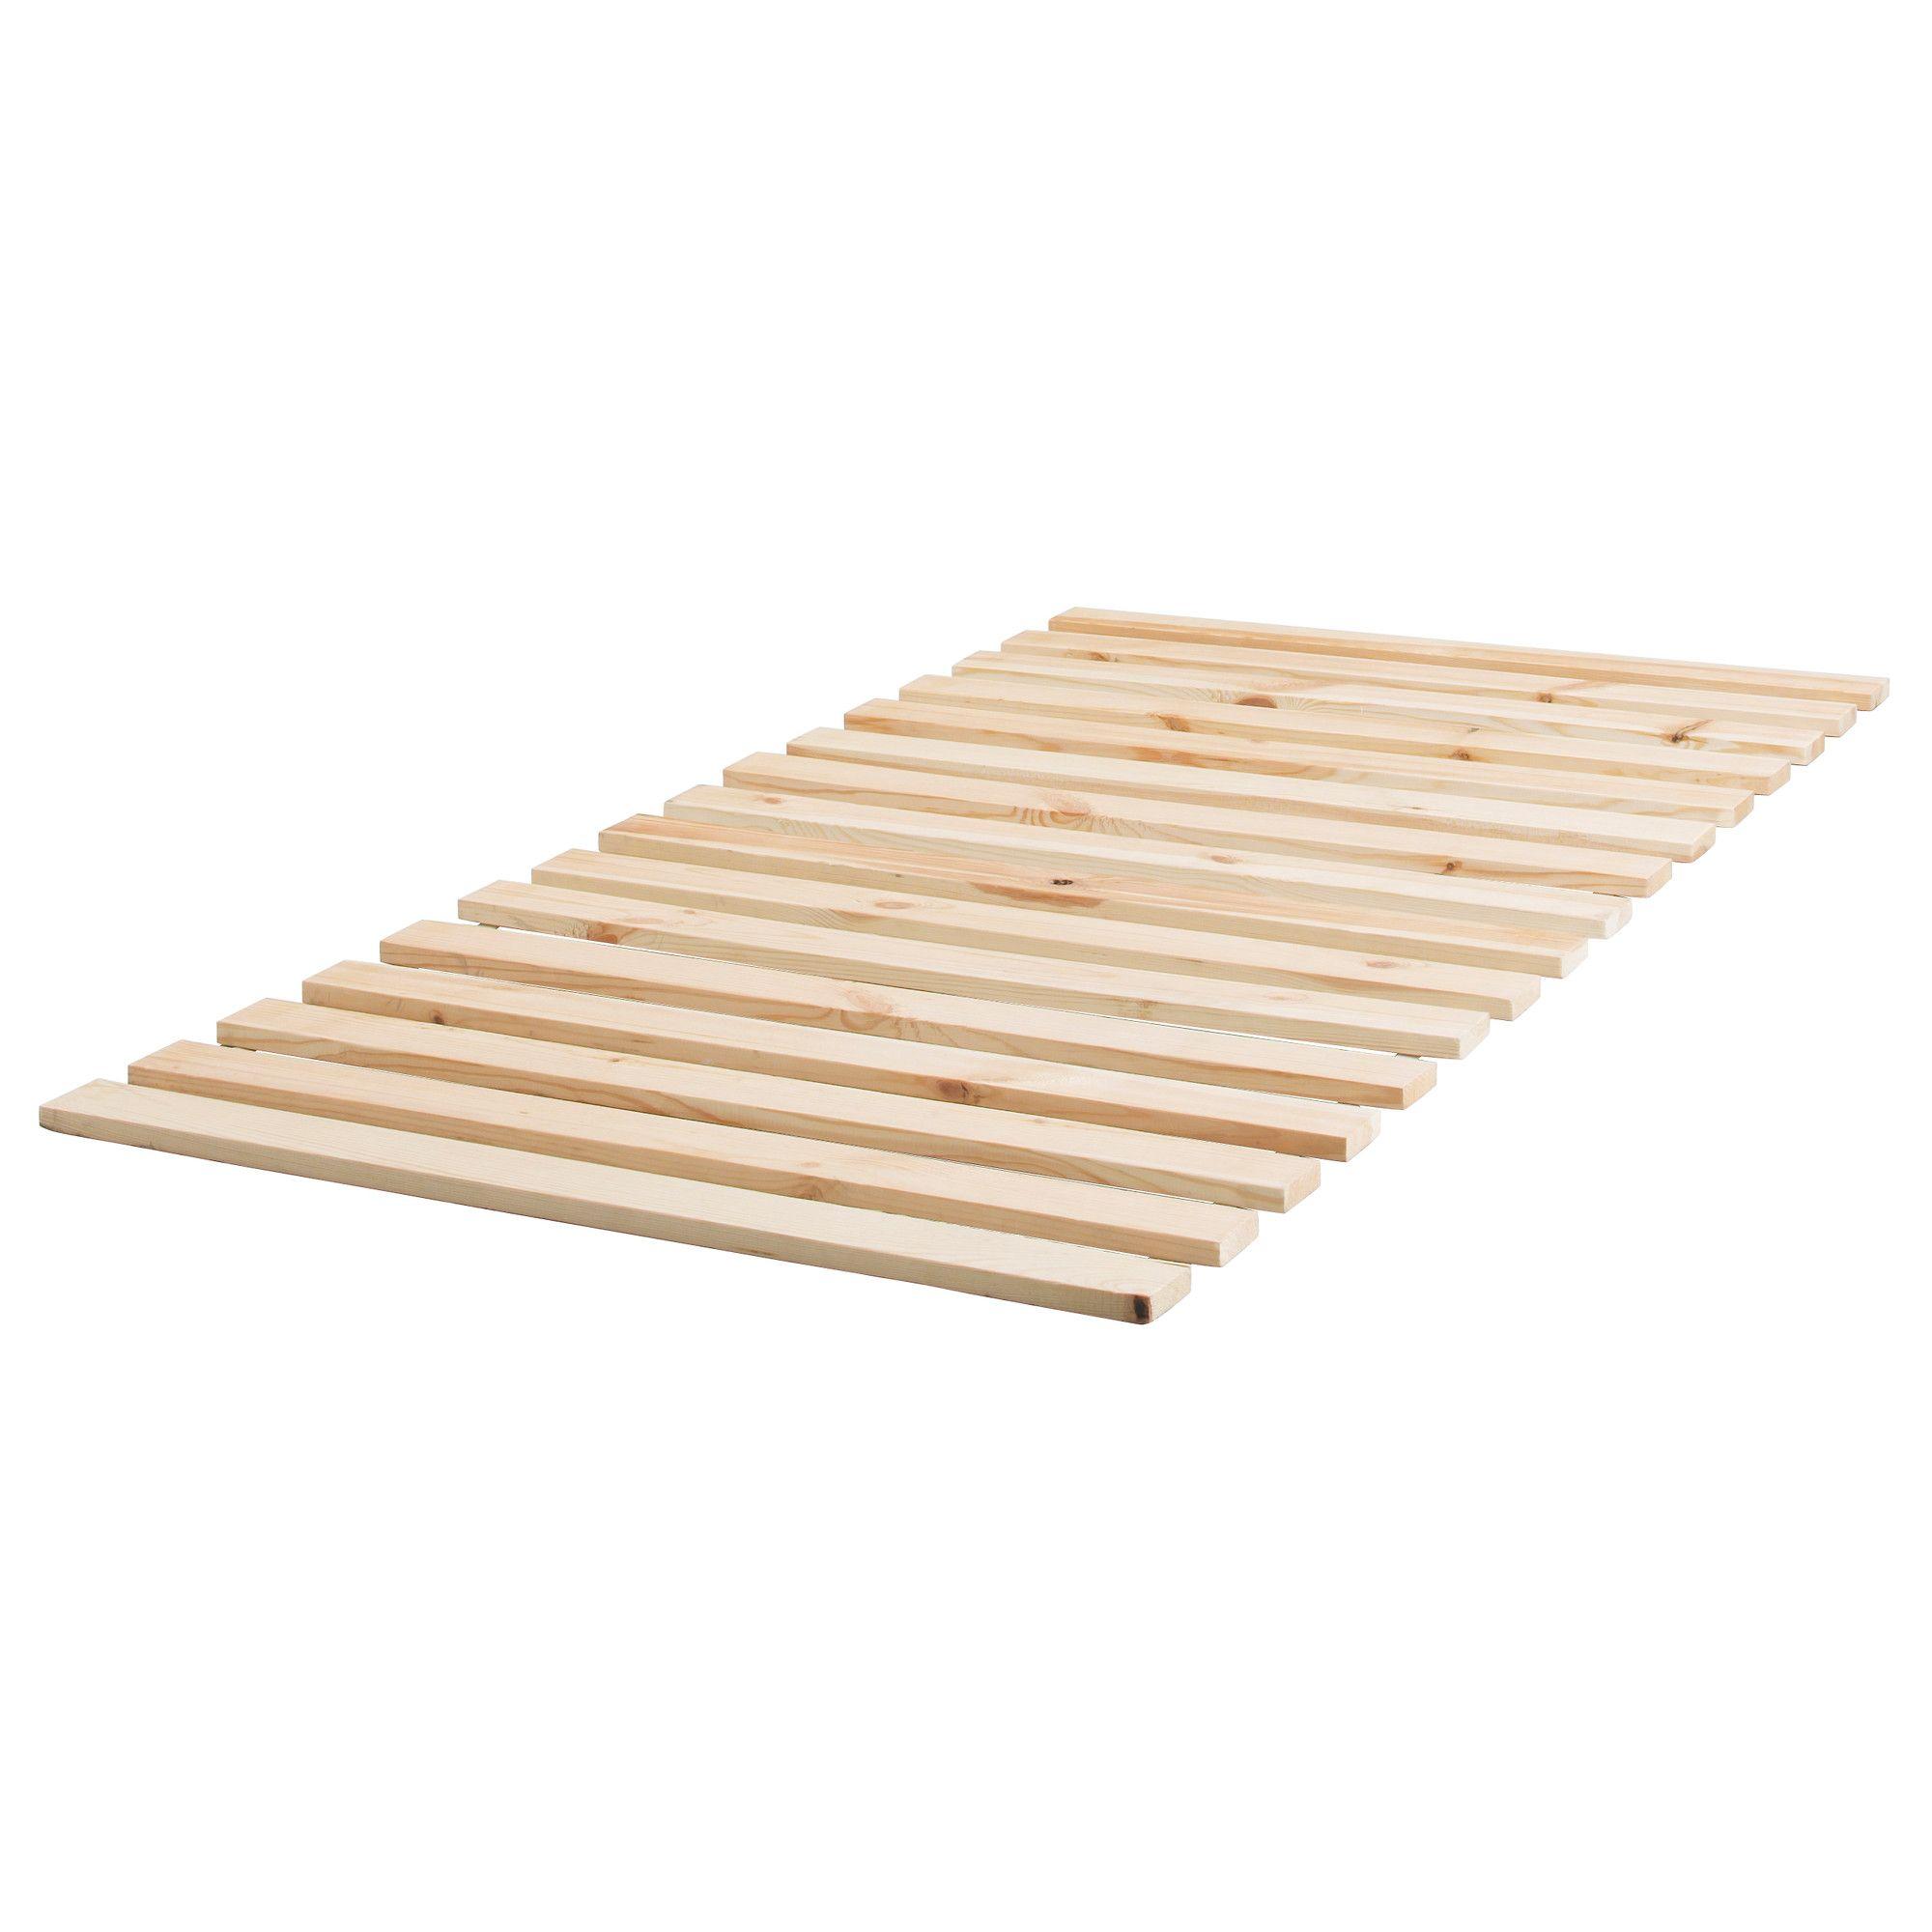 US Furniture and Home Furnishings Bed base, Ikea